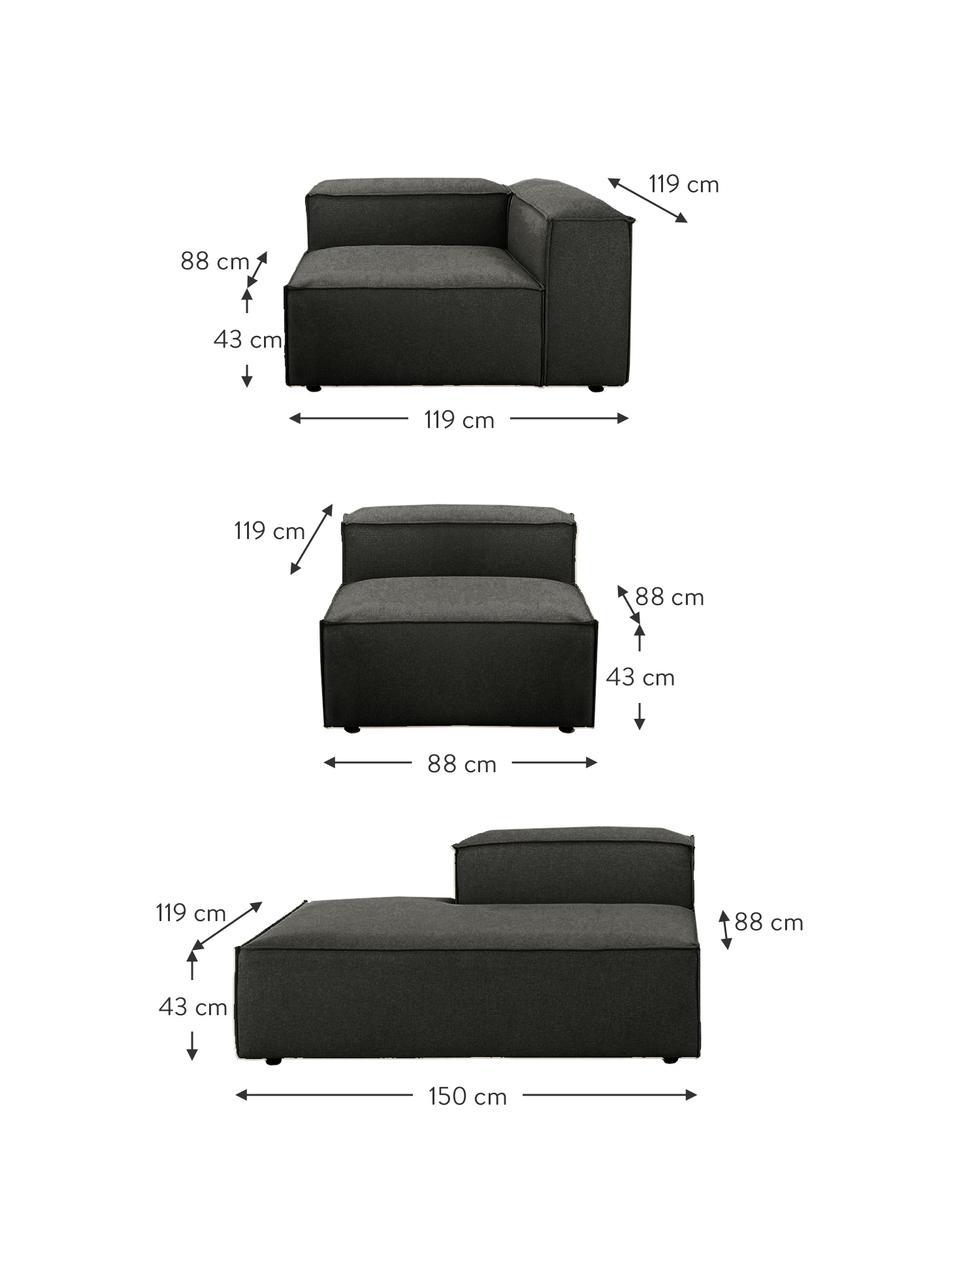 Modulaire XL chaise longue Lennon in antraciet, Bekleding: polyester De hoogwaardige, Frame: massief grenenhout, multi, Poten: kunststof, Geweven stof antraciet, B 357 x D 119 cm